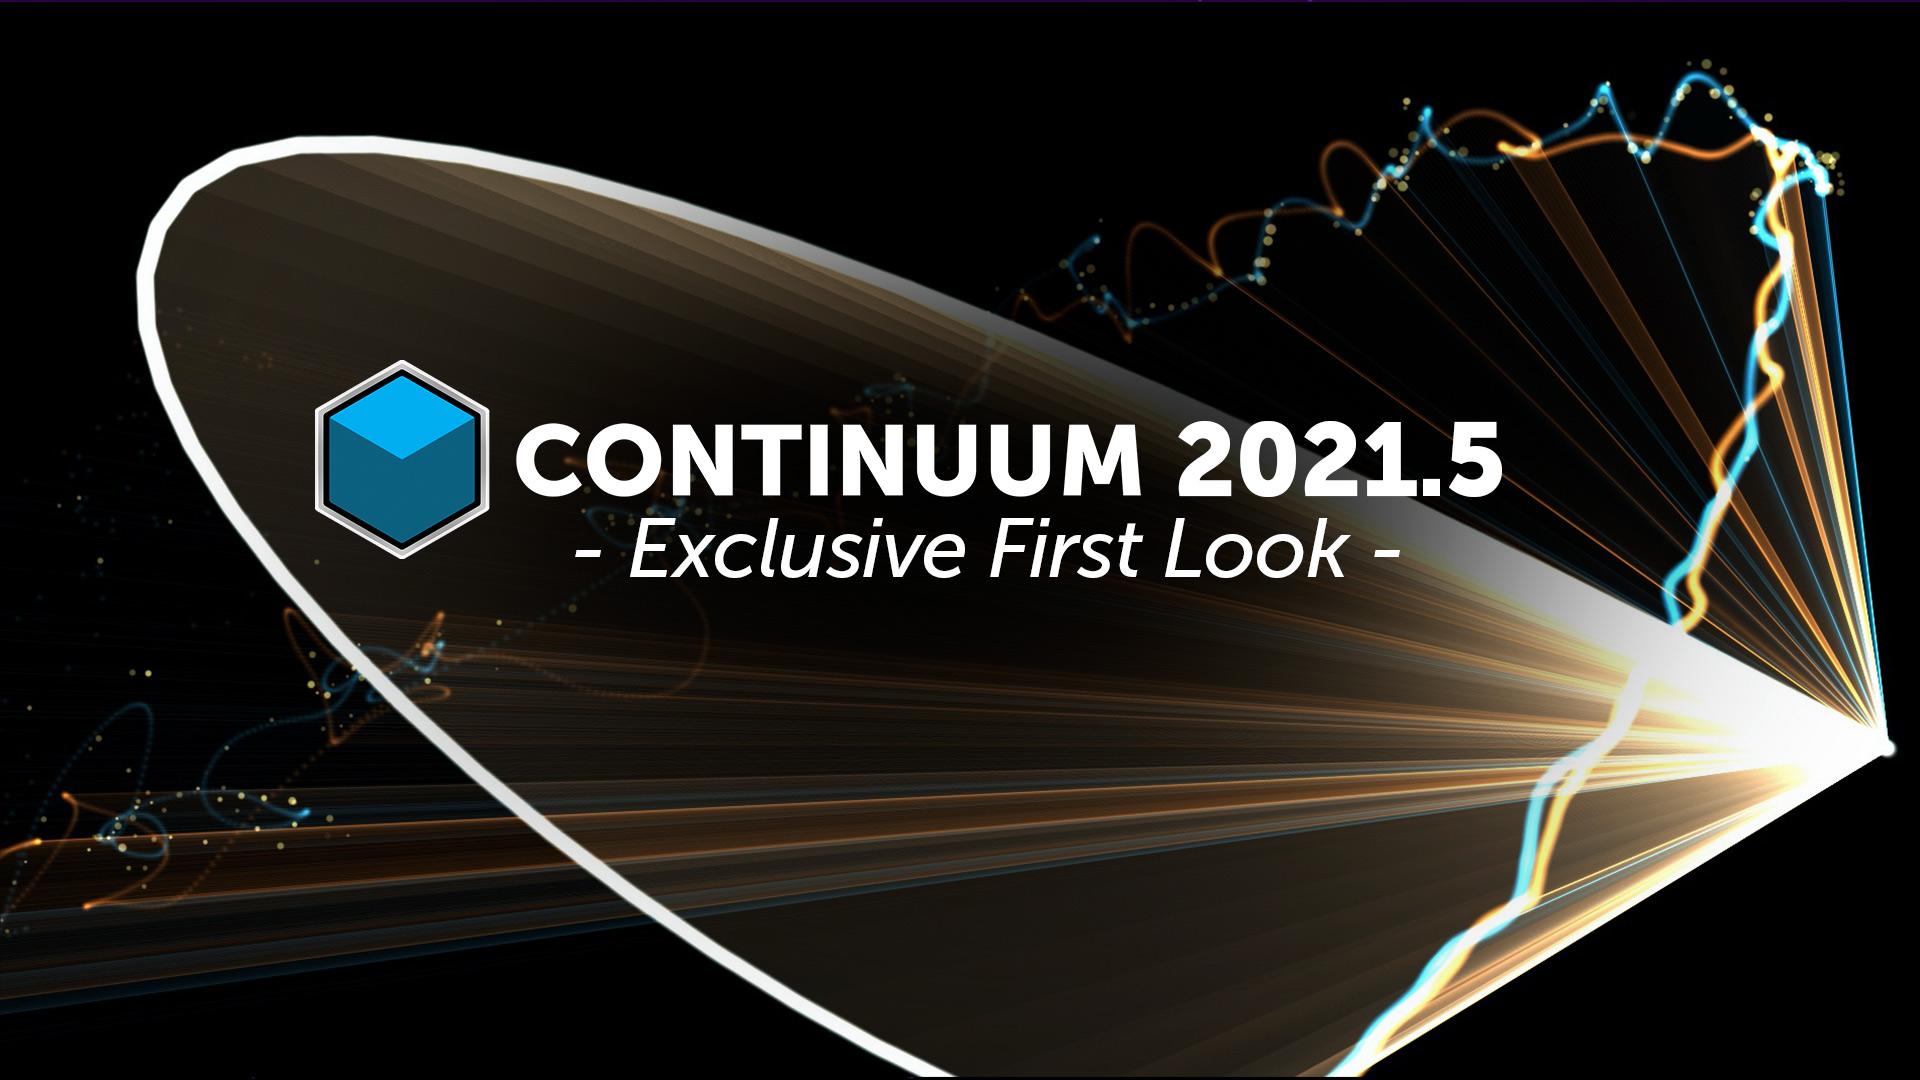 hero image for Continuum 2021.5 live stream